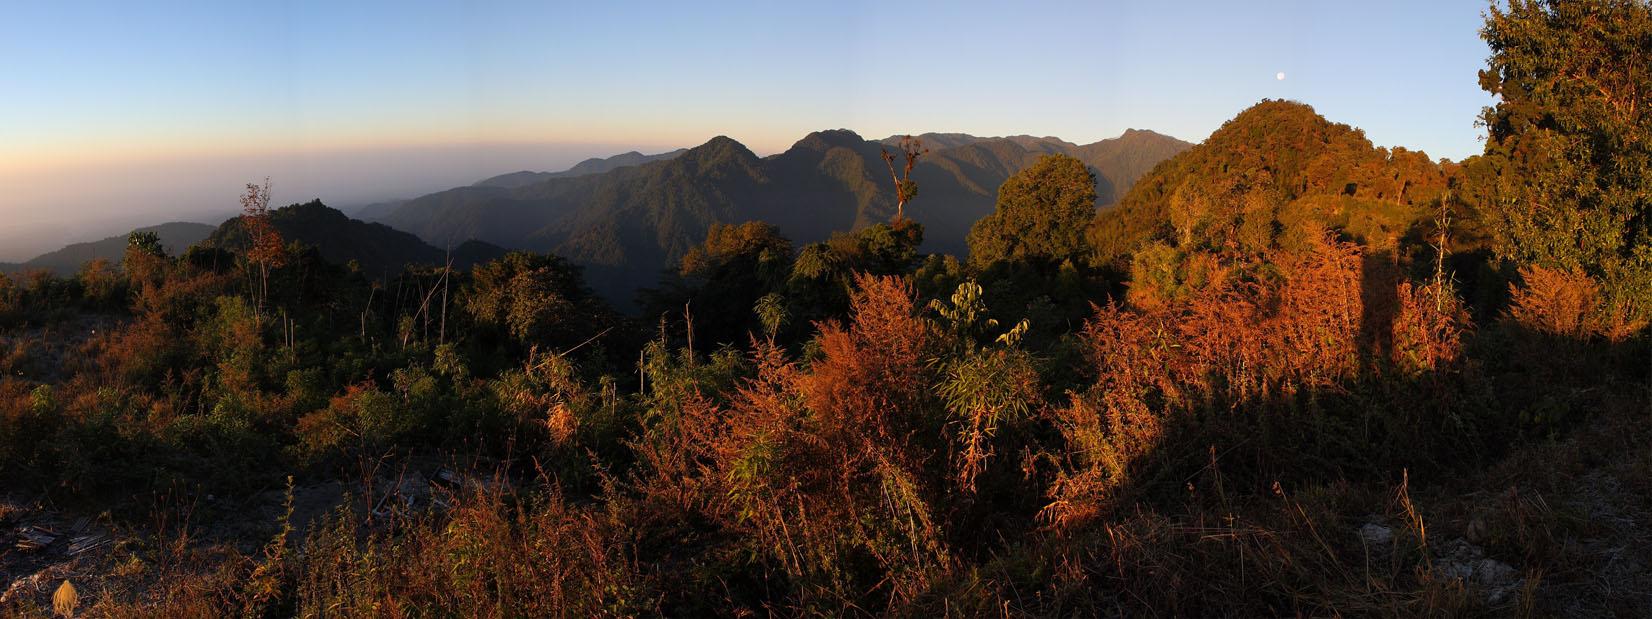 Eaglenest Wildlife Sanctuary View by Rohan Pandit